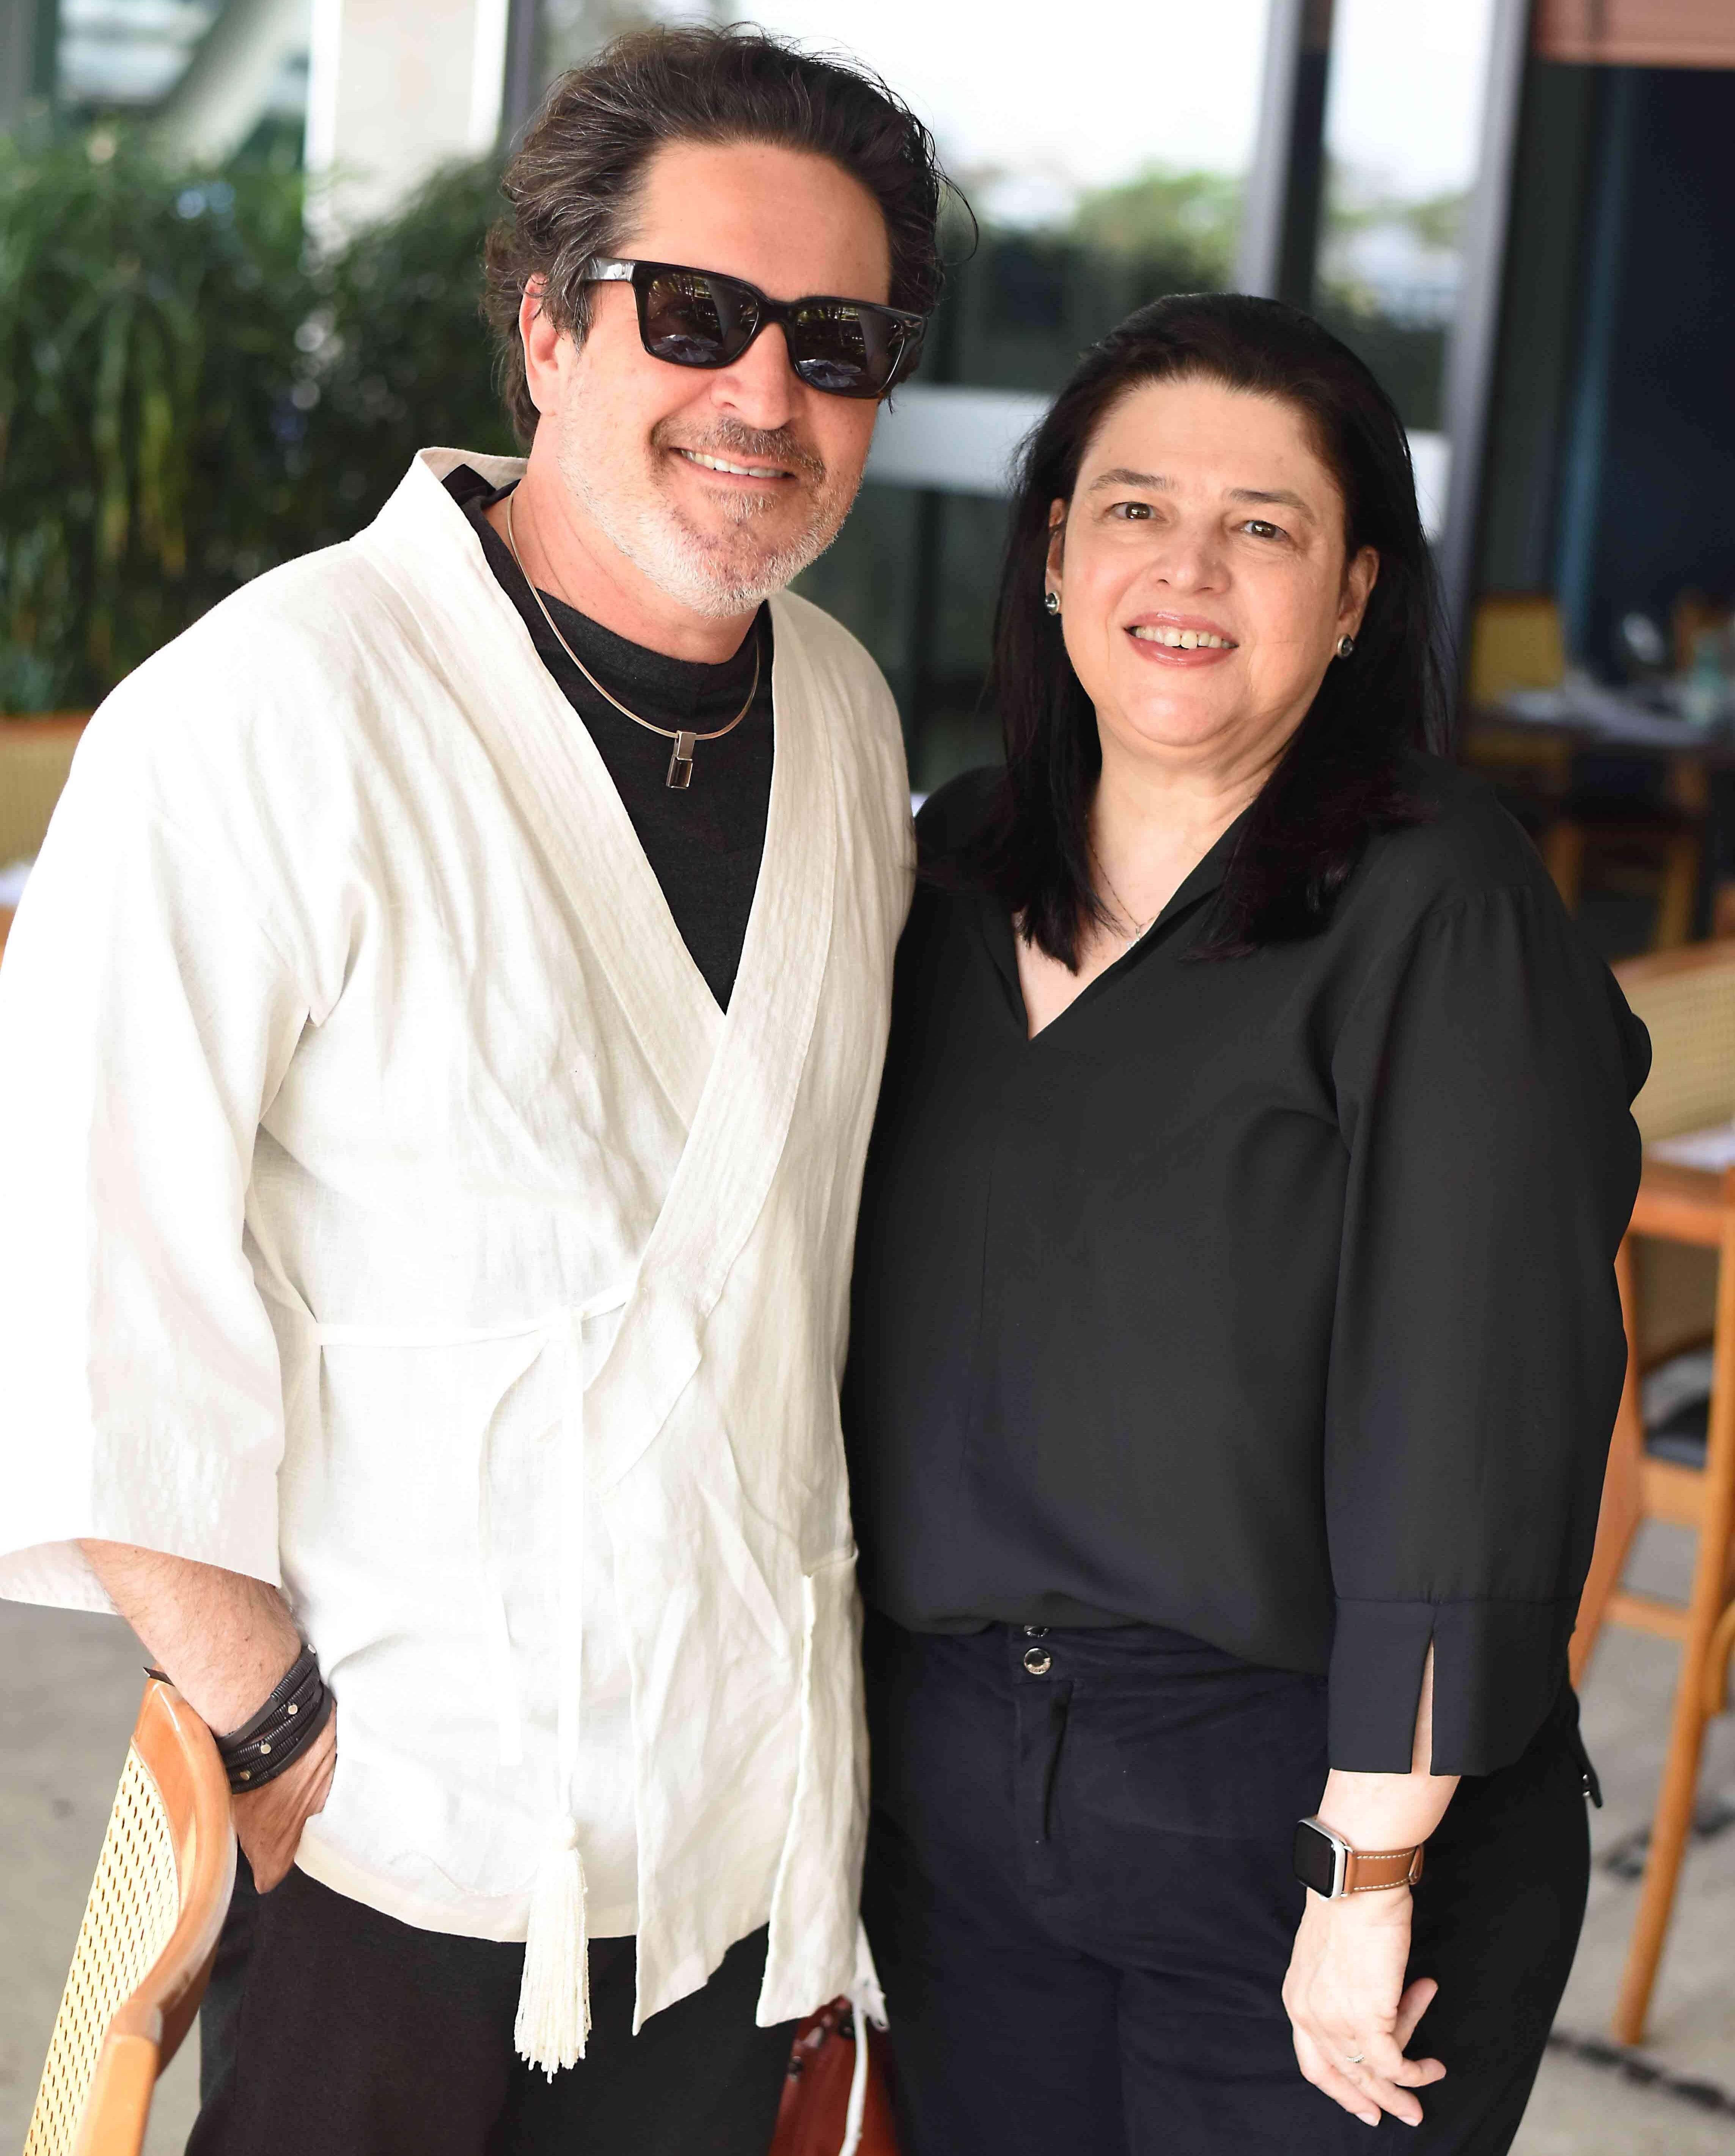 Celso Rayol e Isabela Gobel  /Foto: Breton/Ari Kaye